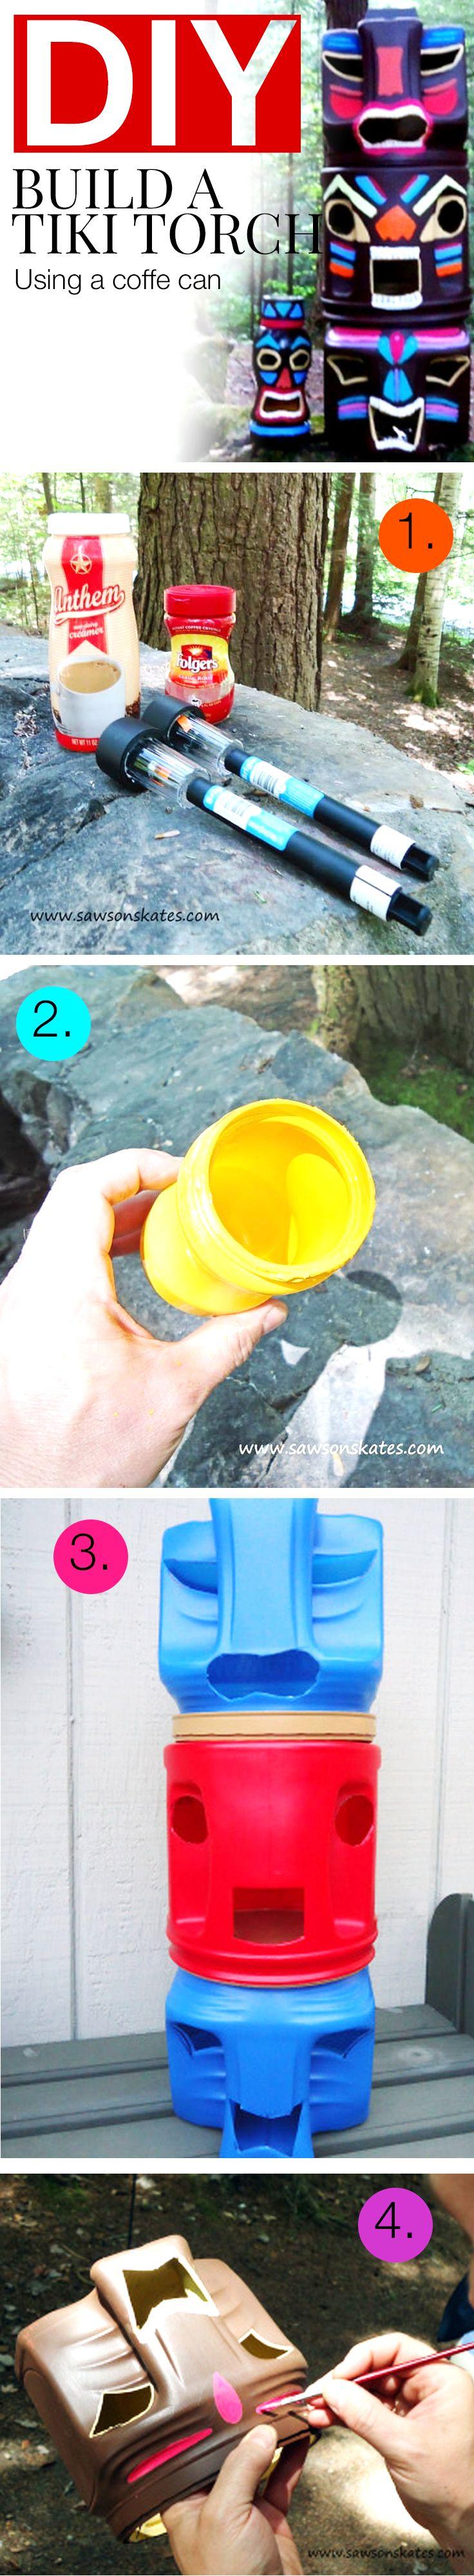 DIY Coffee Can Tiki Torches